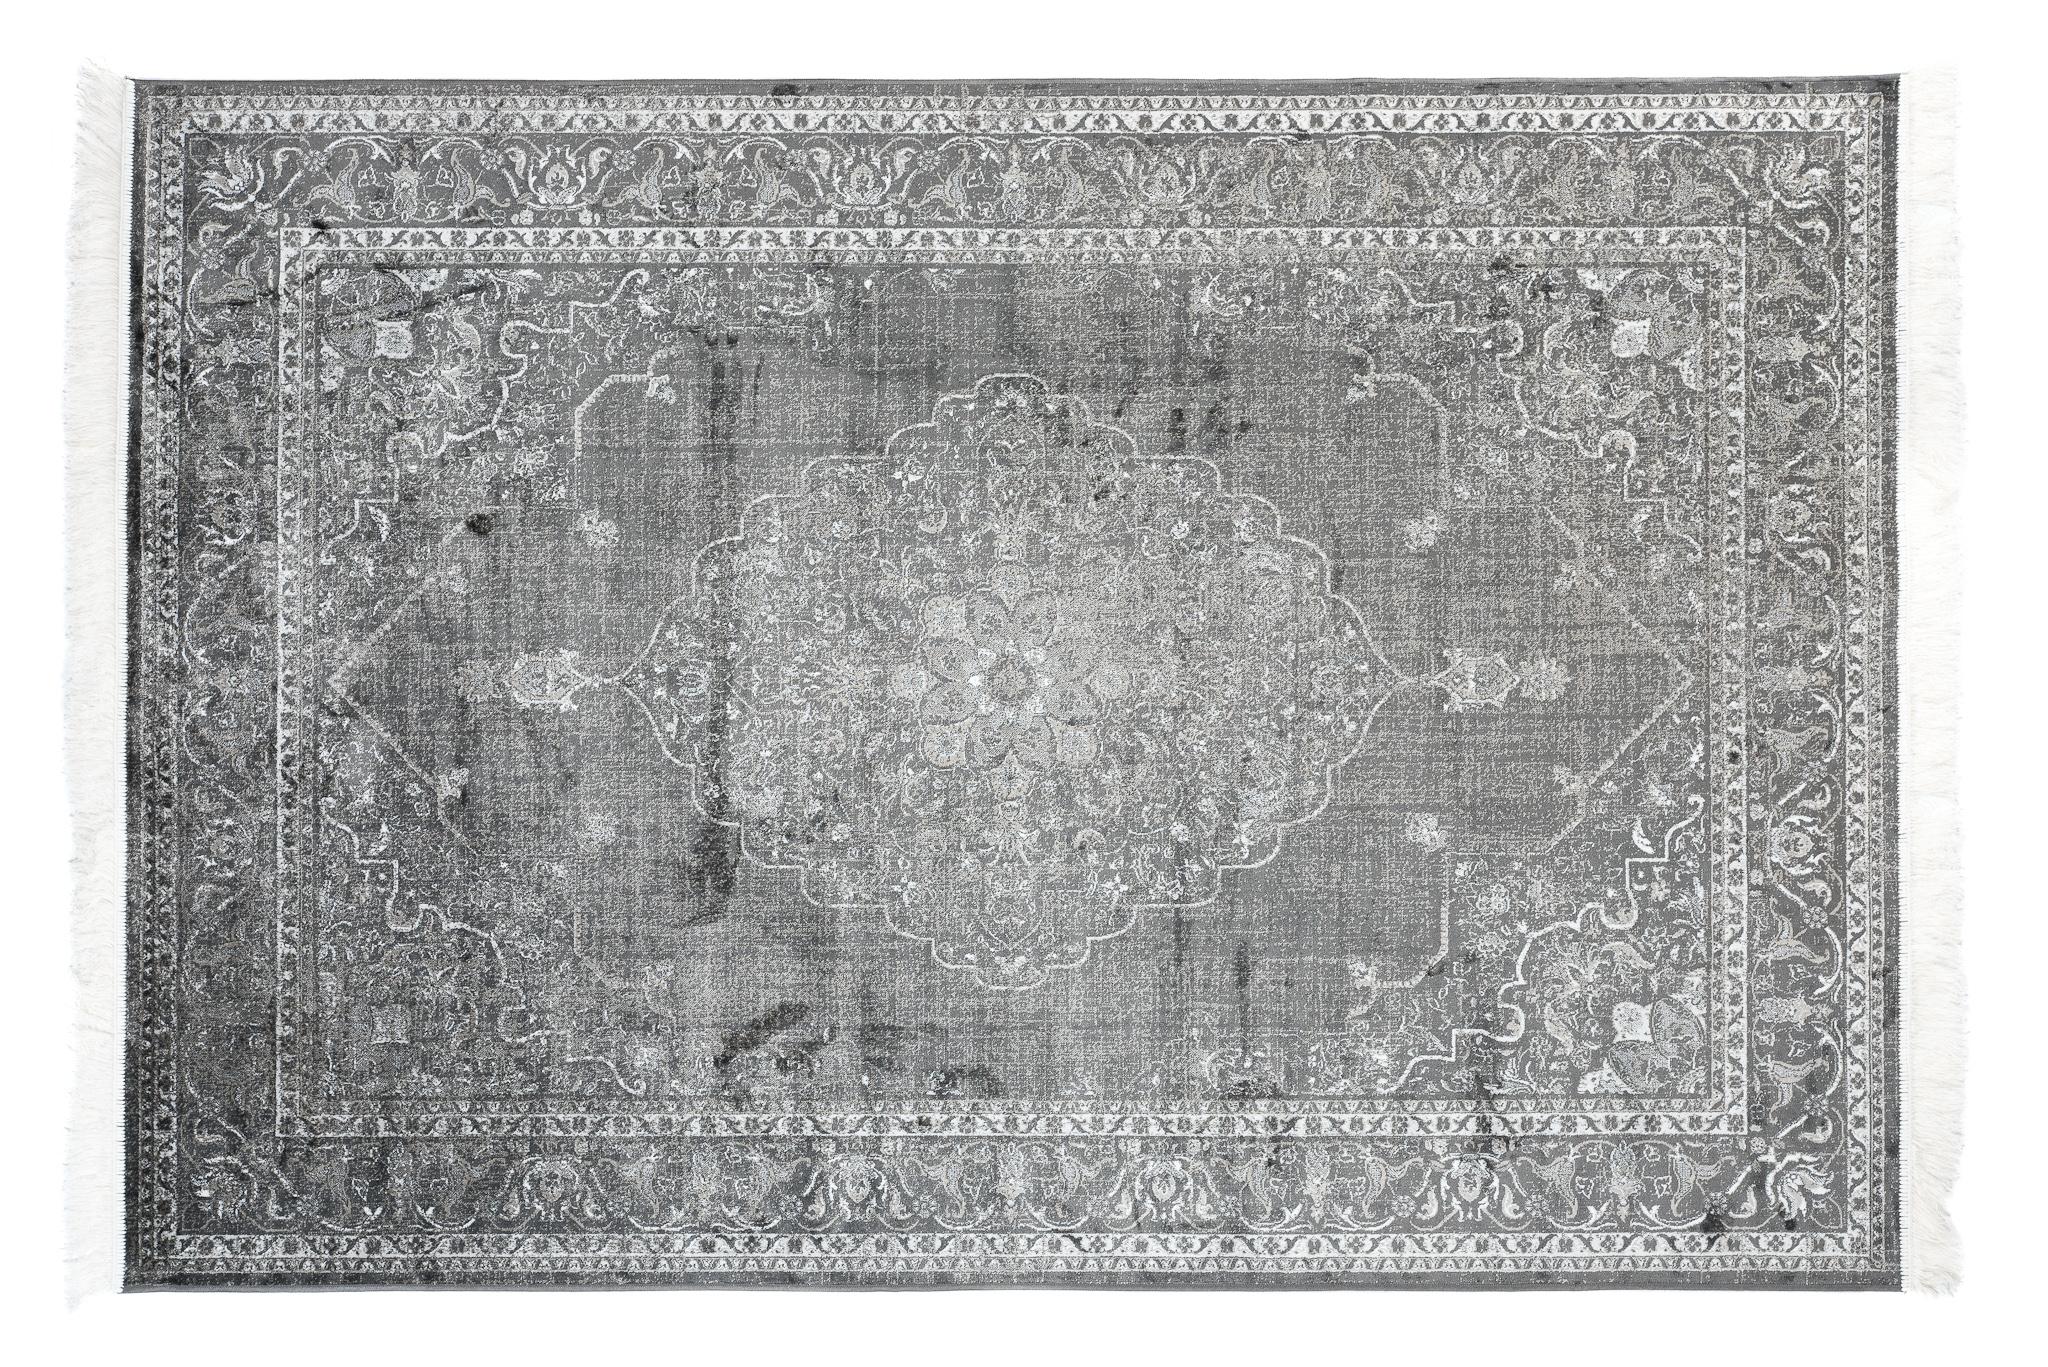 Dywan tradycyjny Isphahan 84279/68 czarny